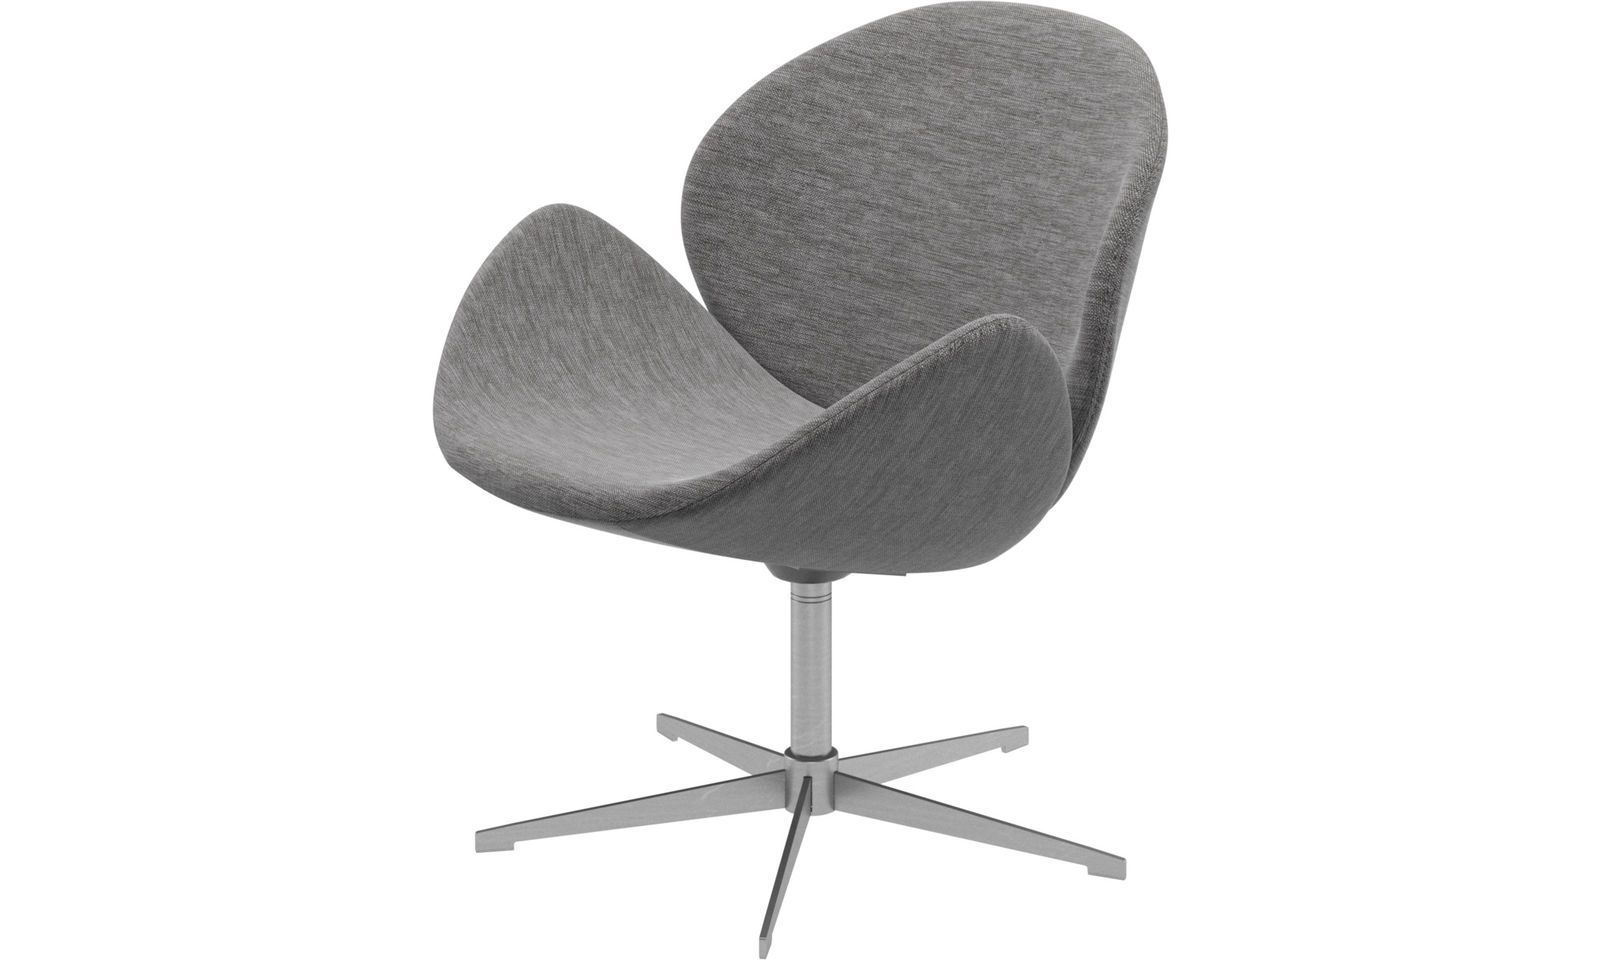 Two BoConcept OGI swivel chairs   FINN.no